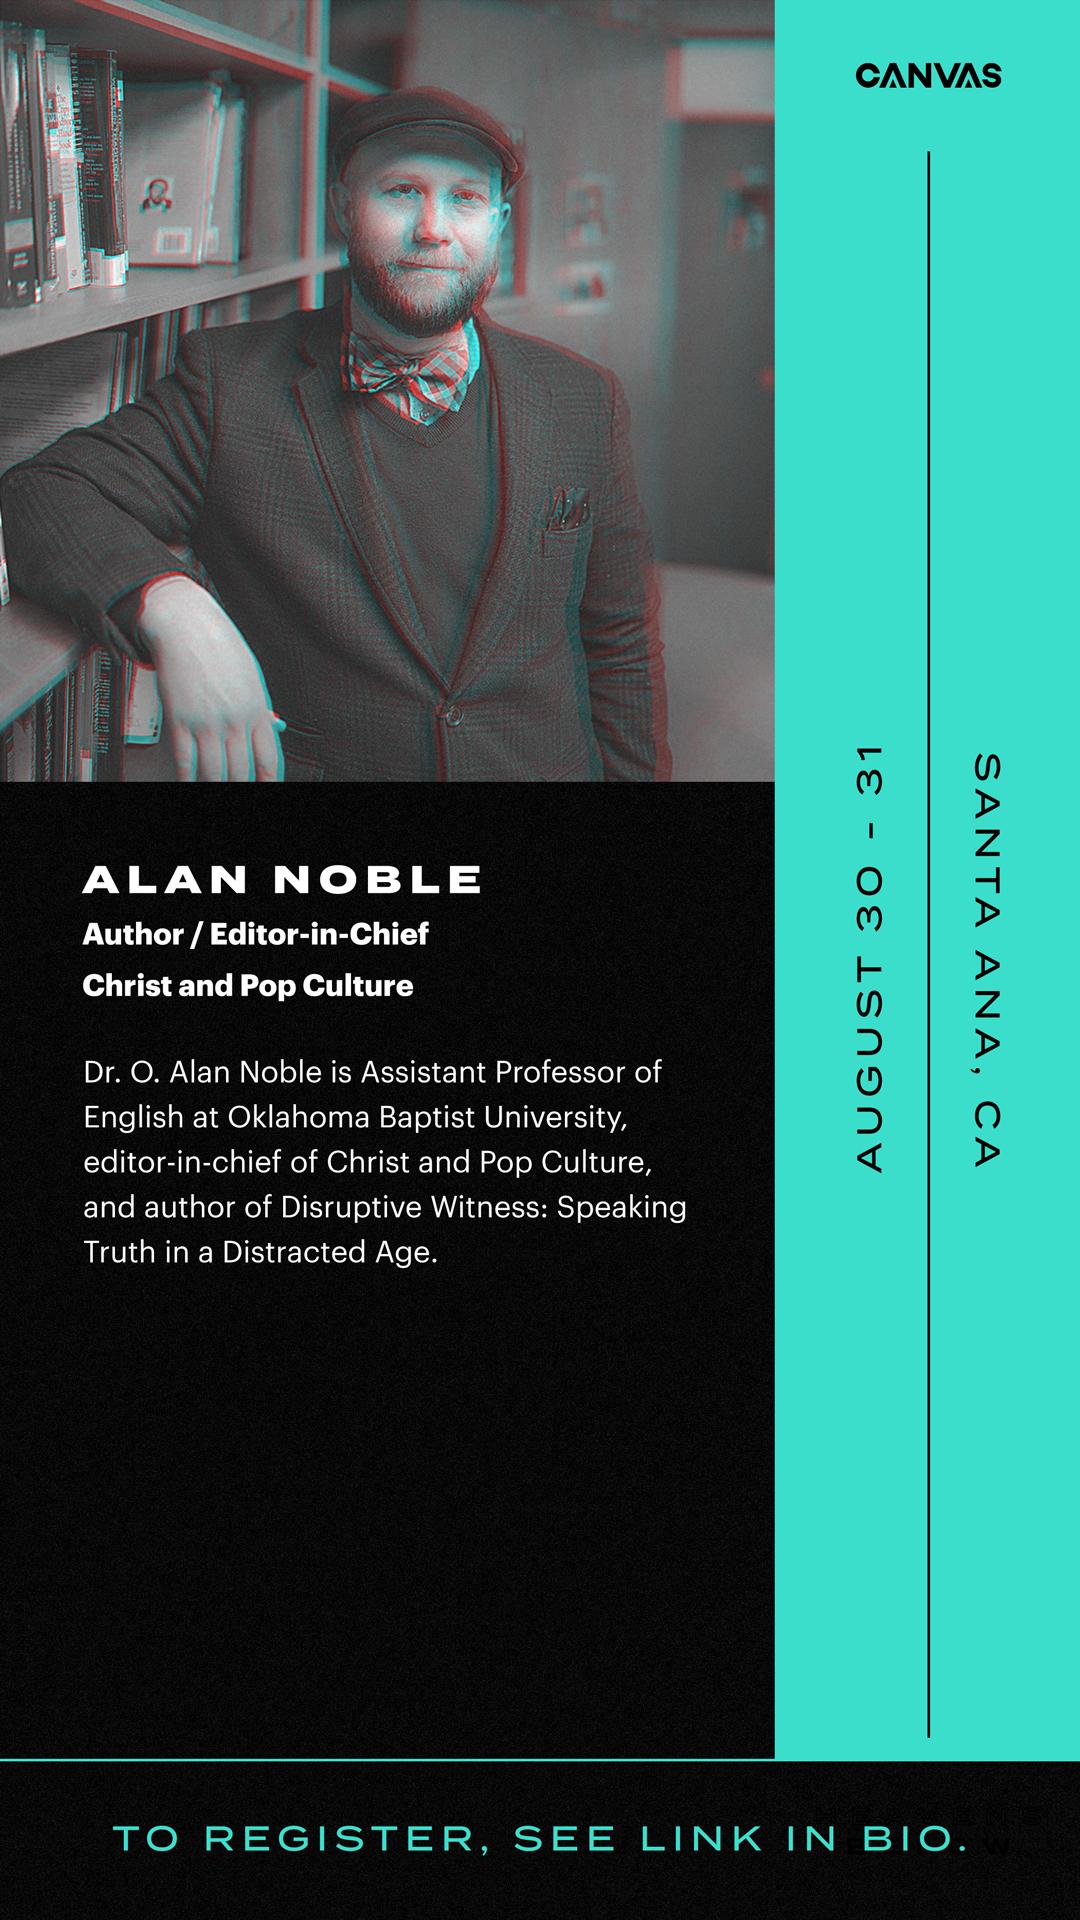 Alan-Noble_story.jpg